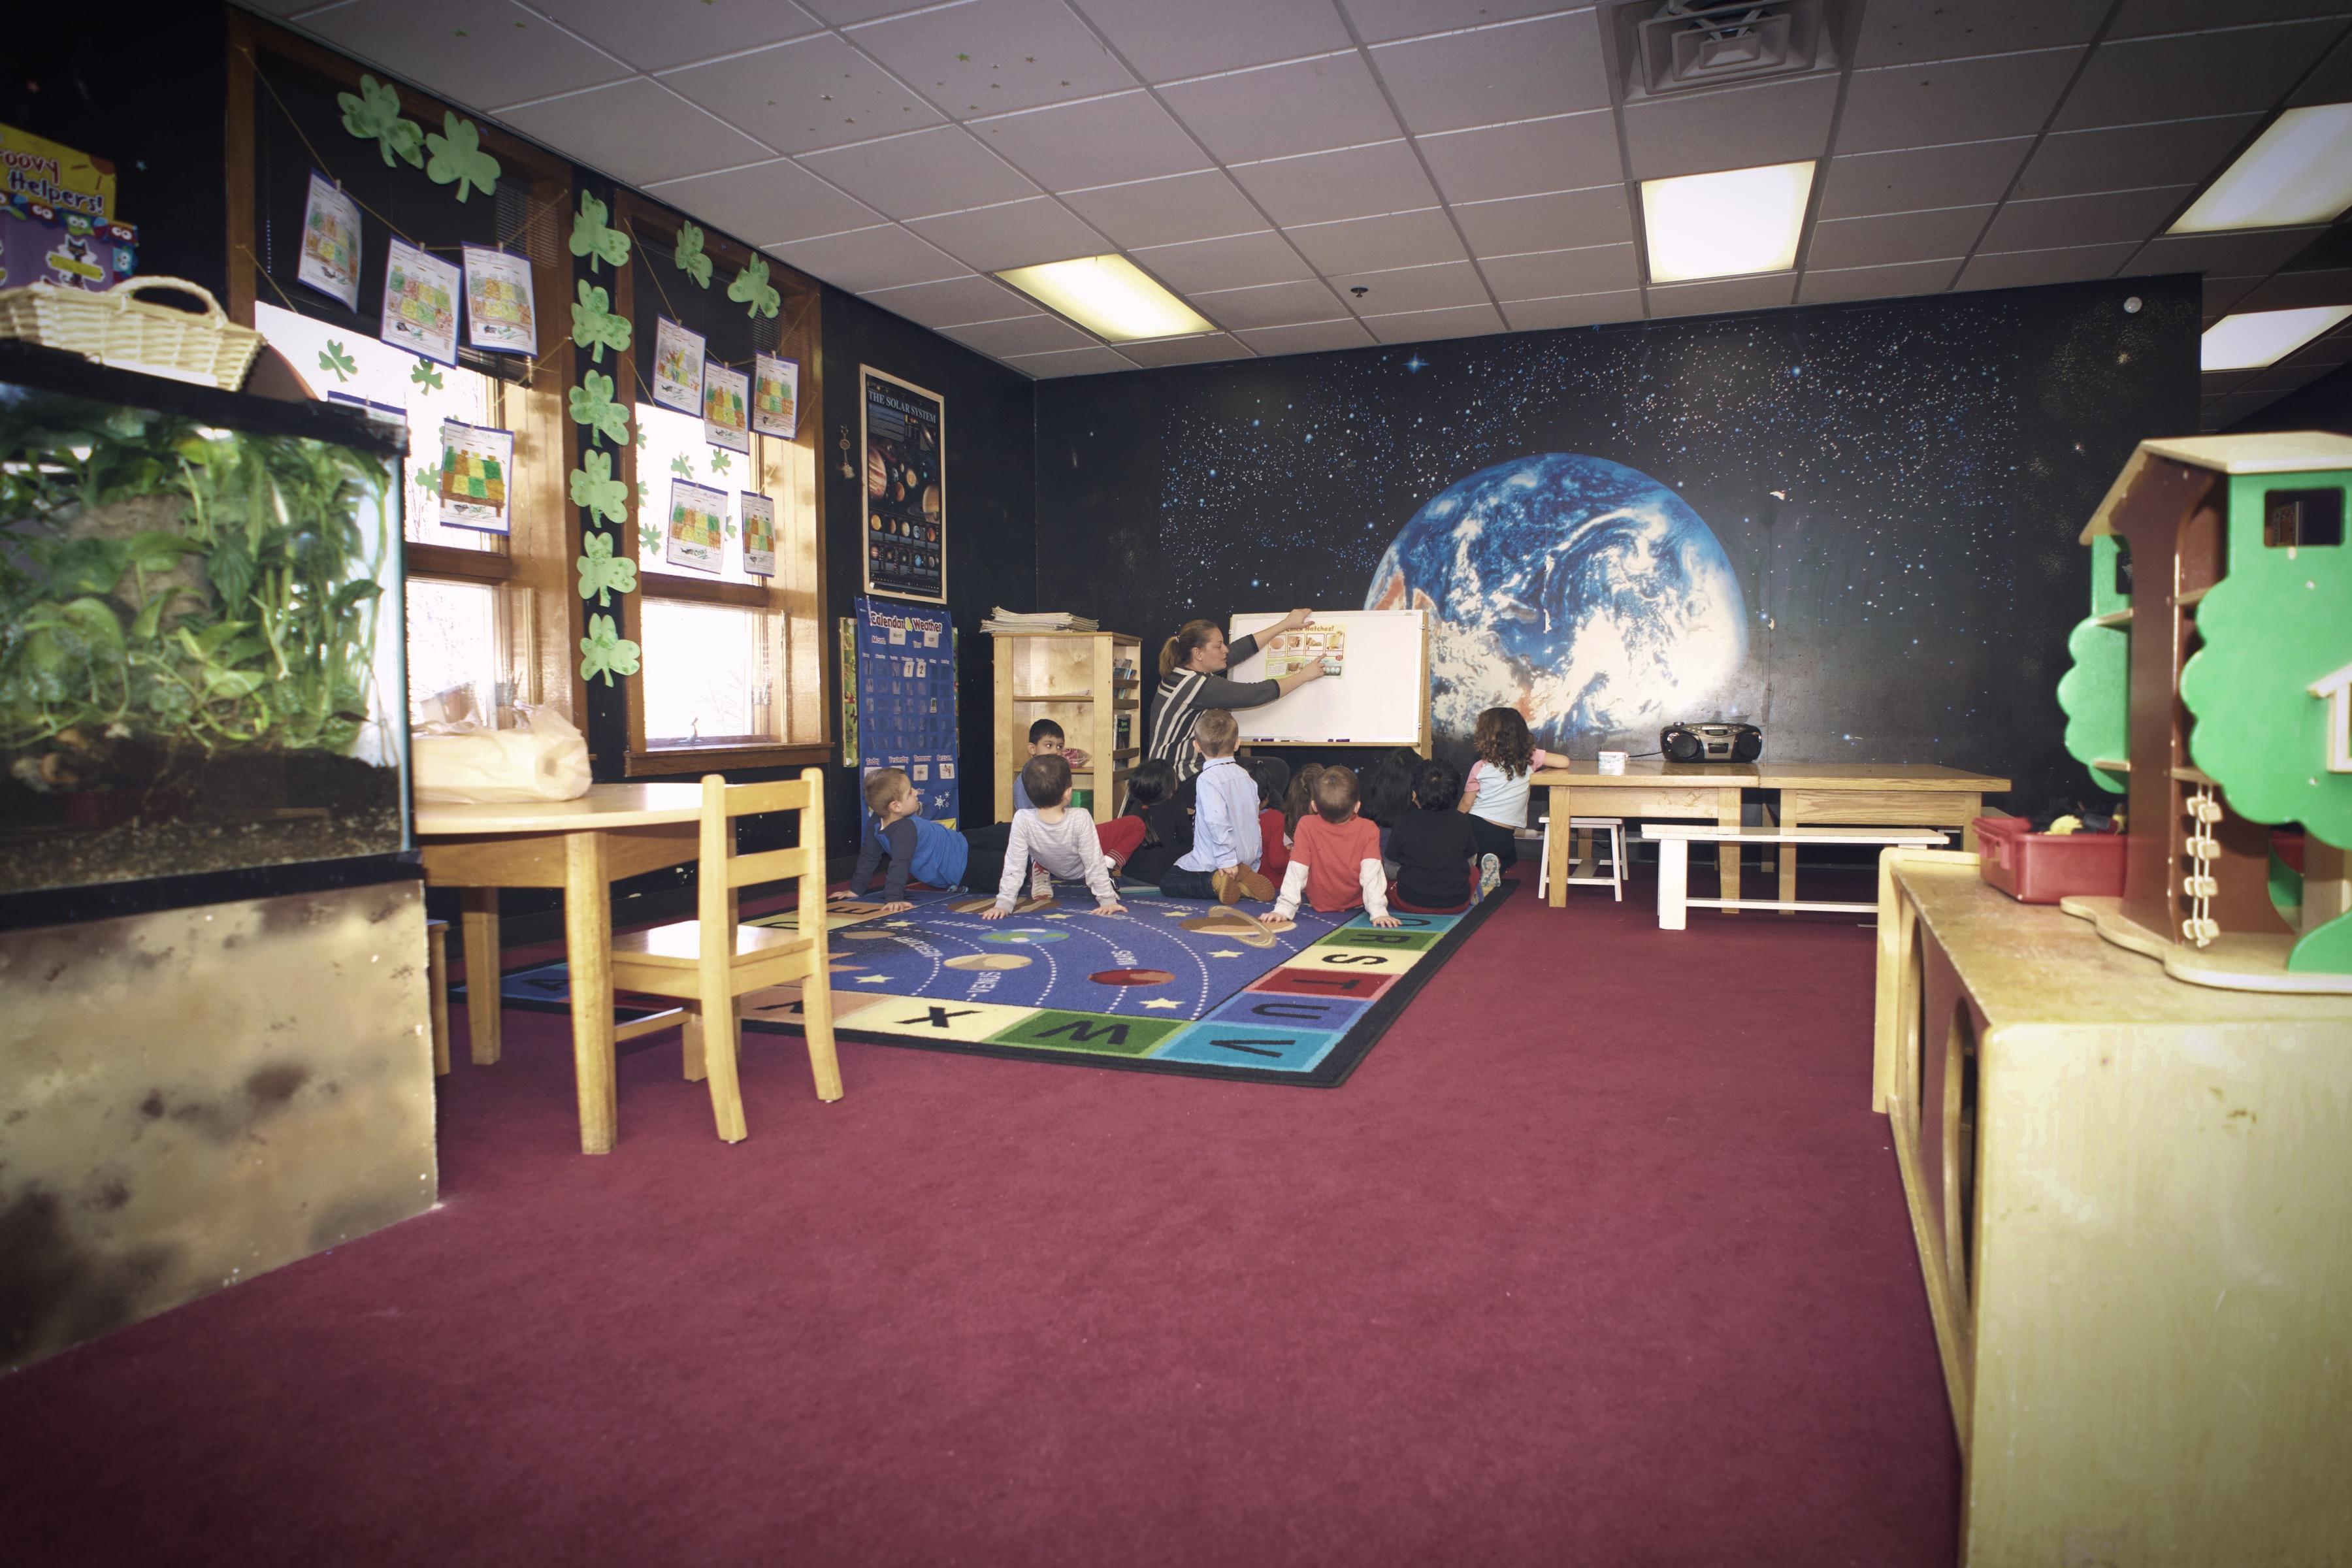 The Meadow's School image 4